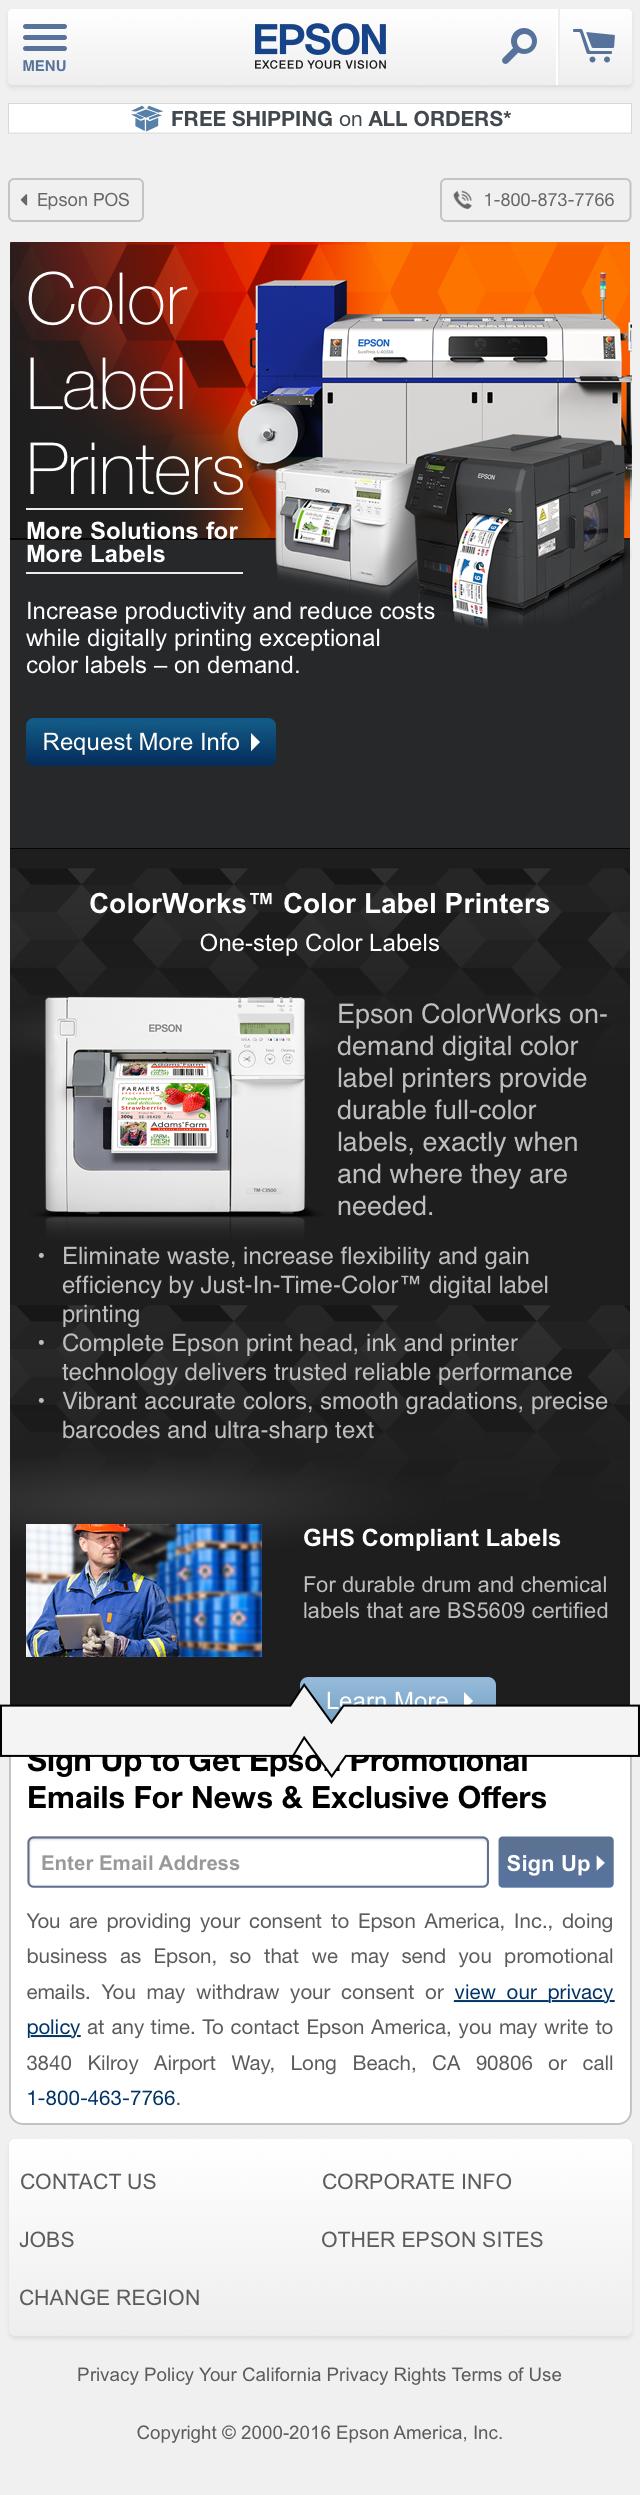 Printers - Color Label Printers